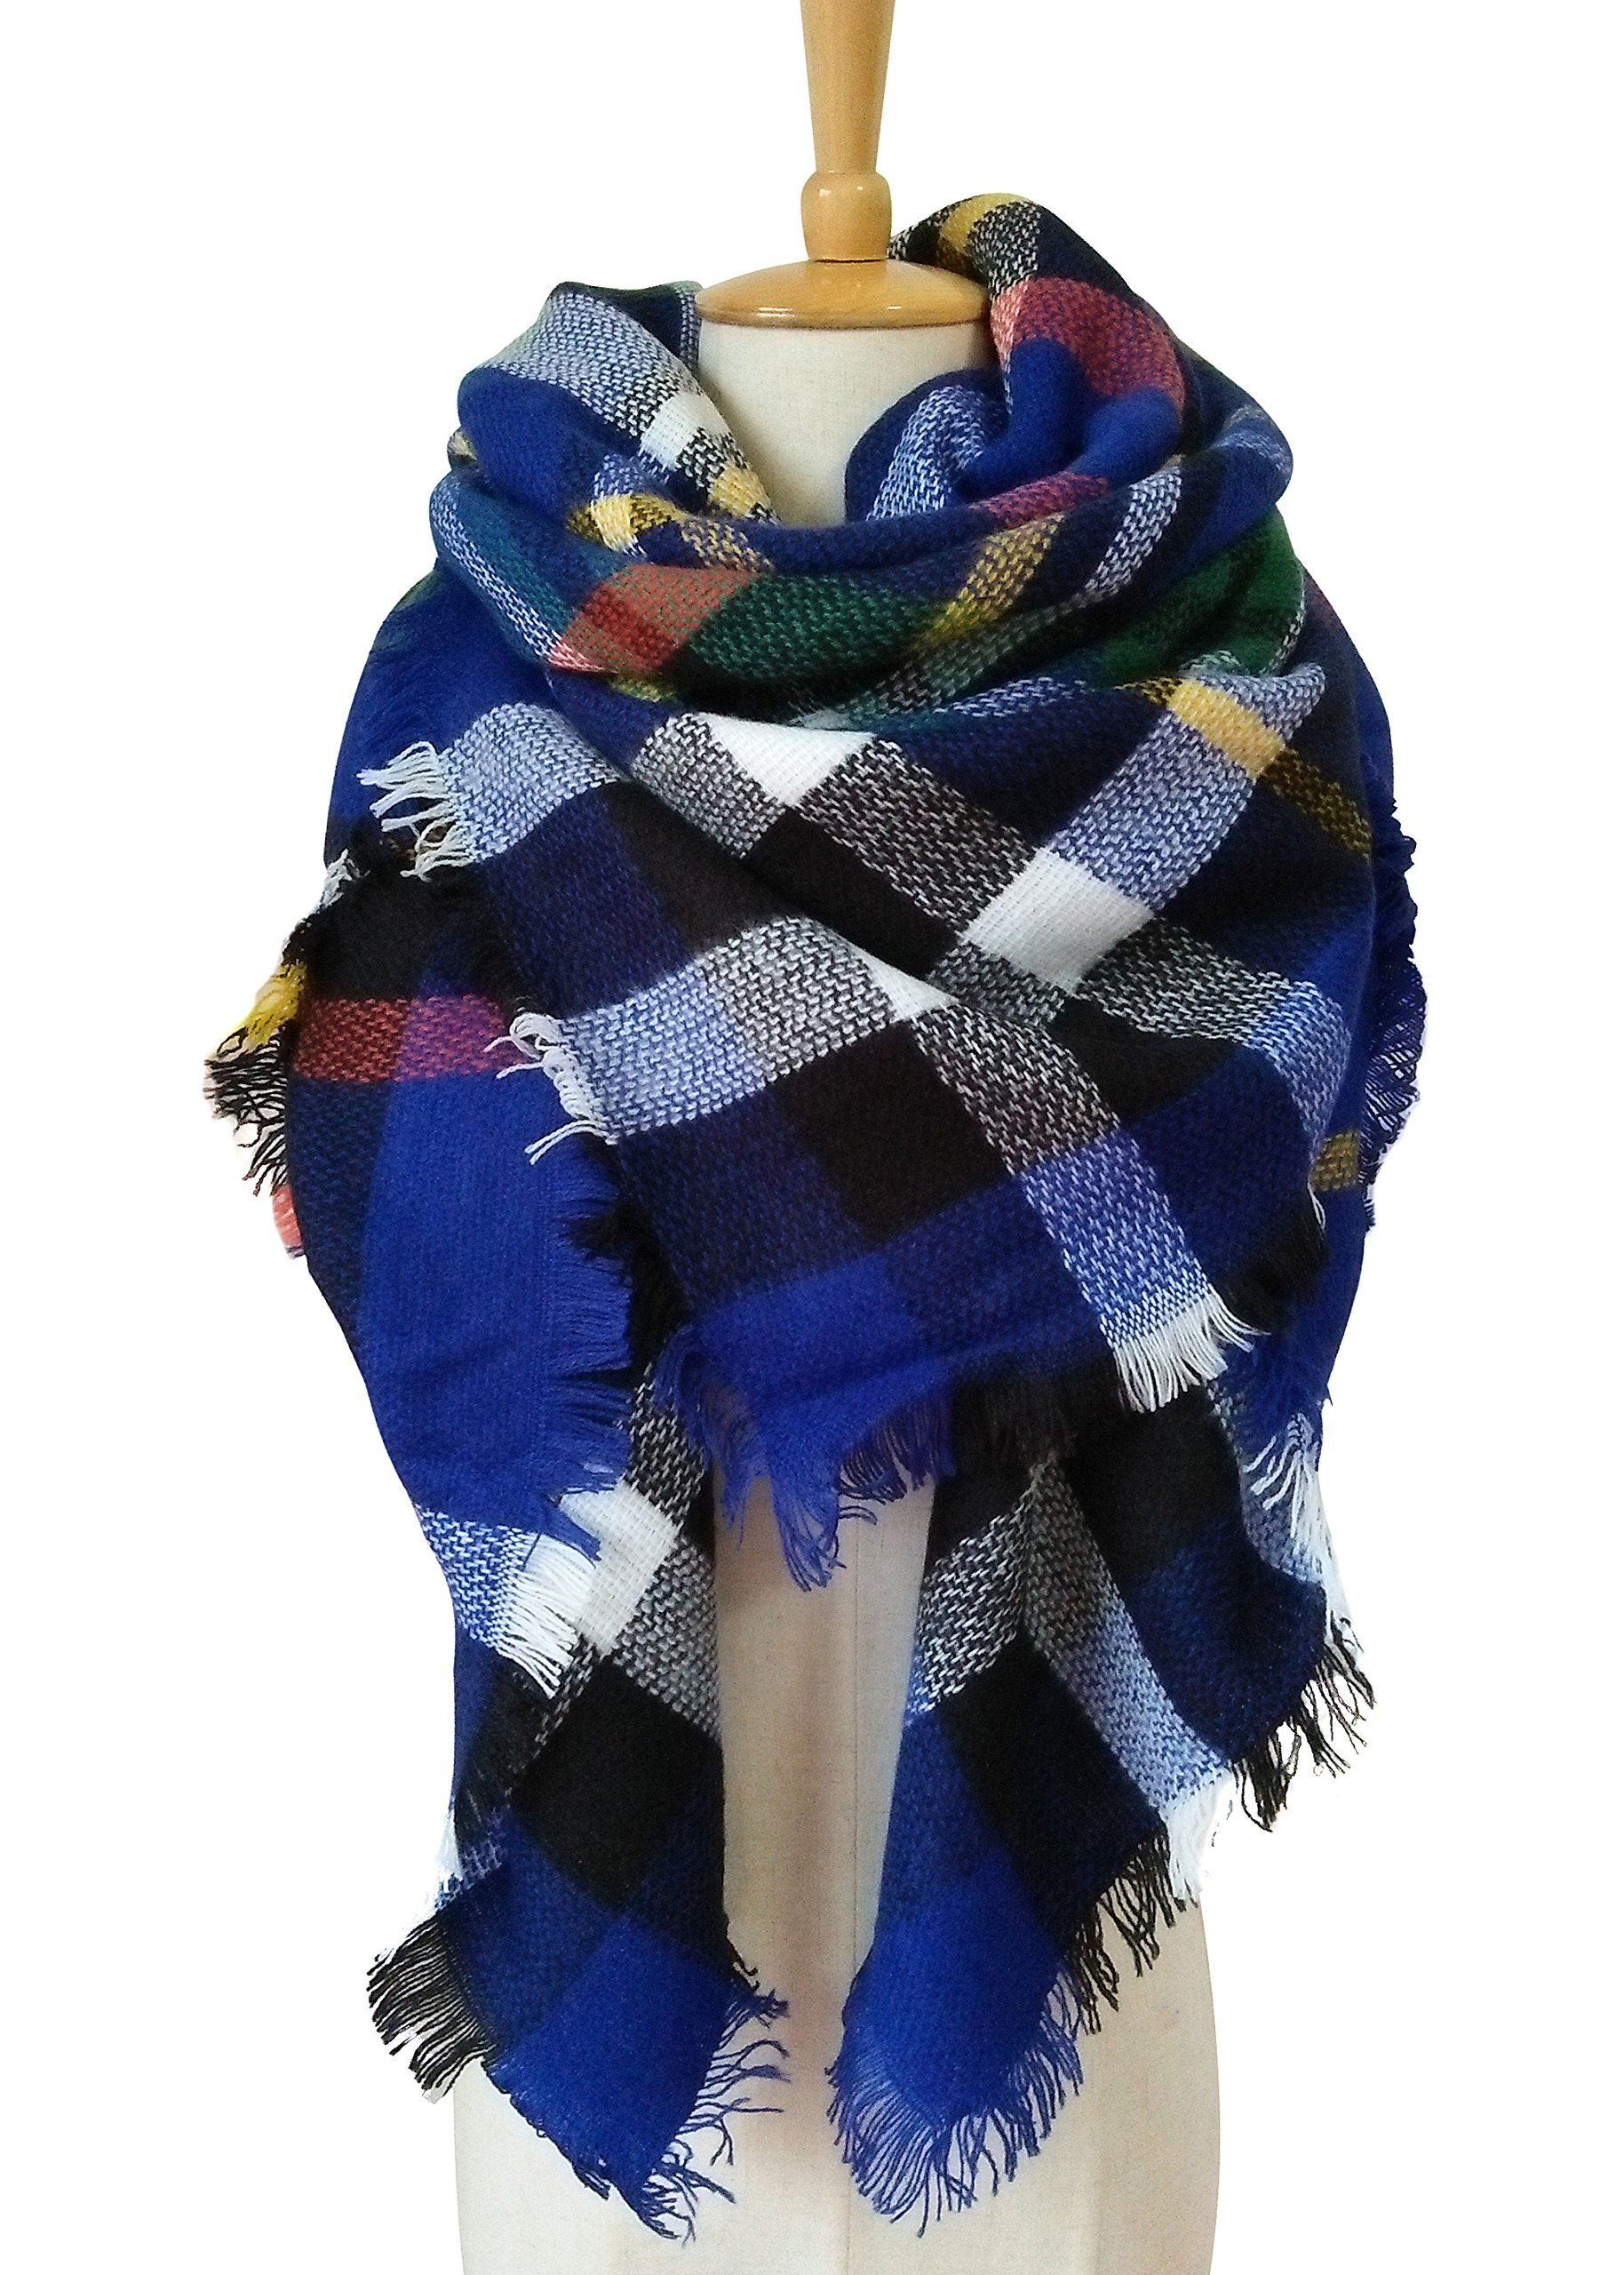 MOTINE Tartan Blanket Scarf Stylish Winter Warm Pashmina Wrap Shawl for Women (Blue)